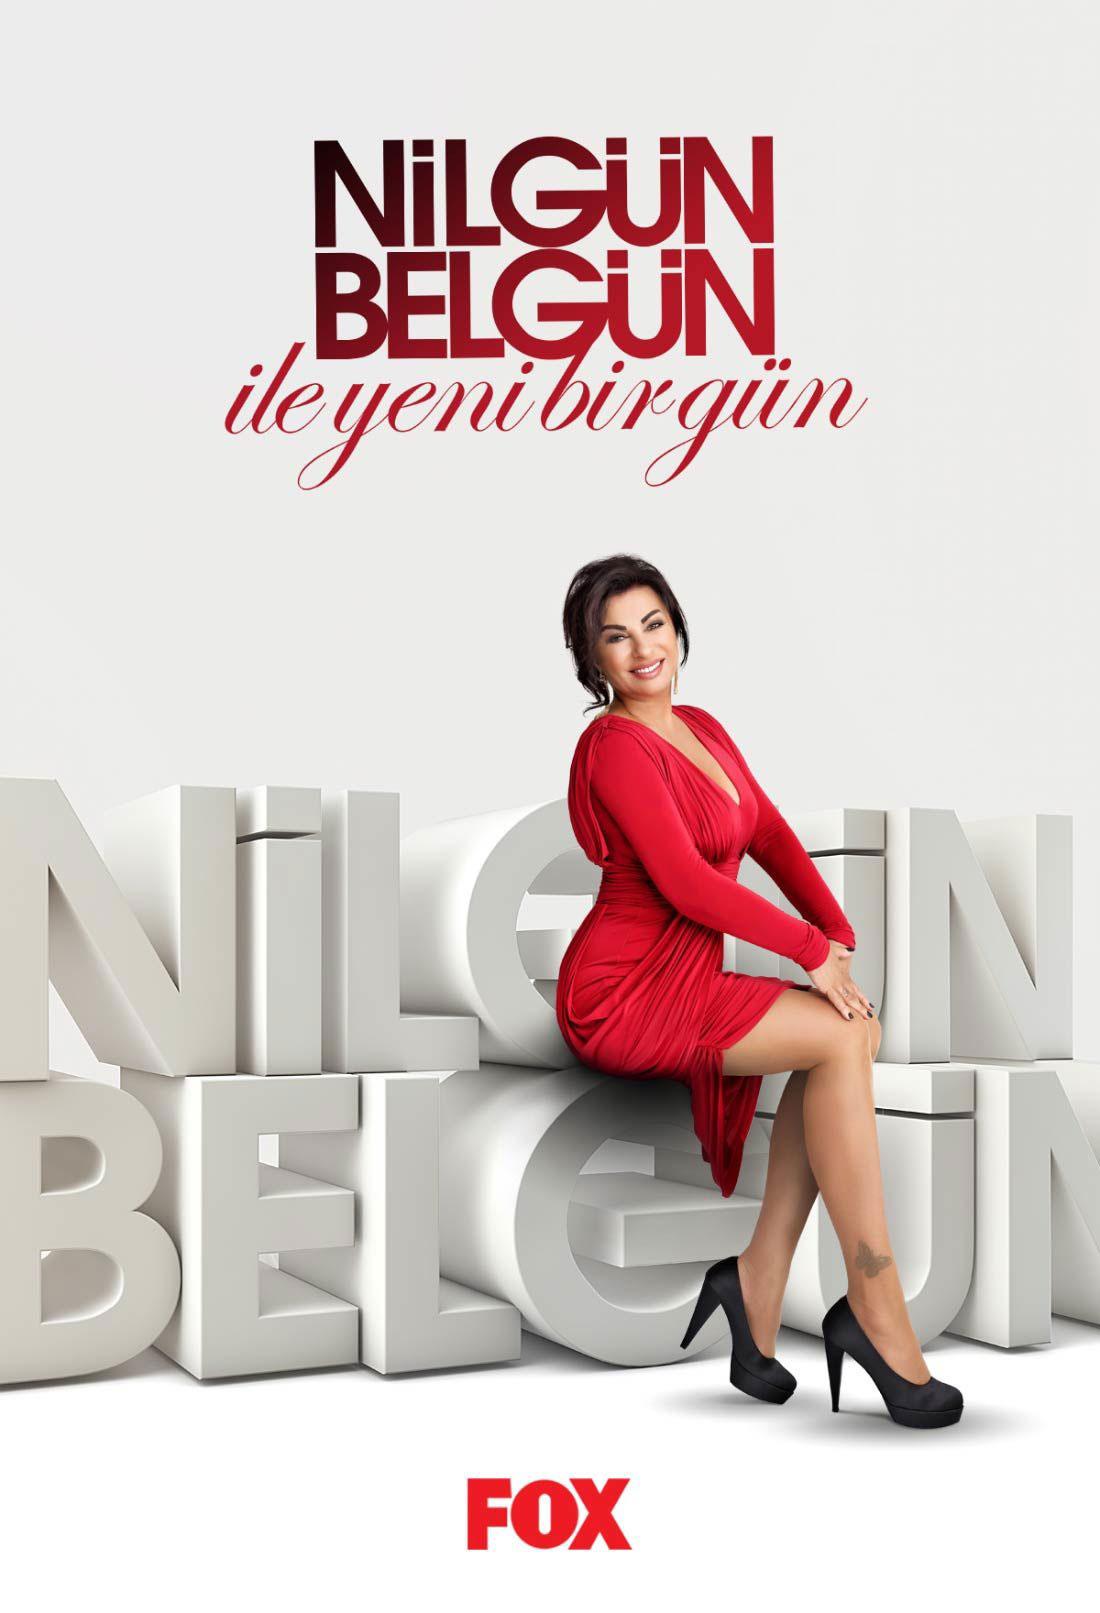 nilgun-belgun-01